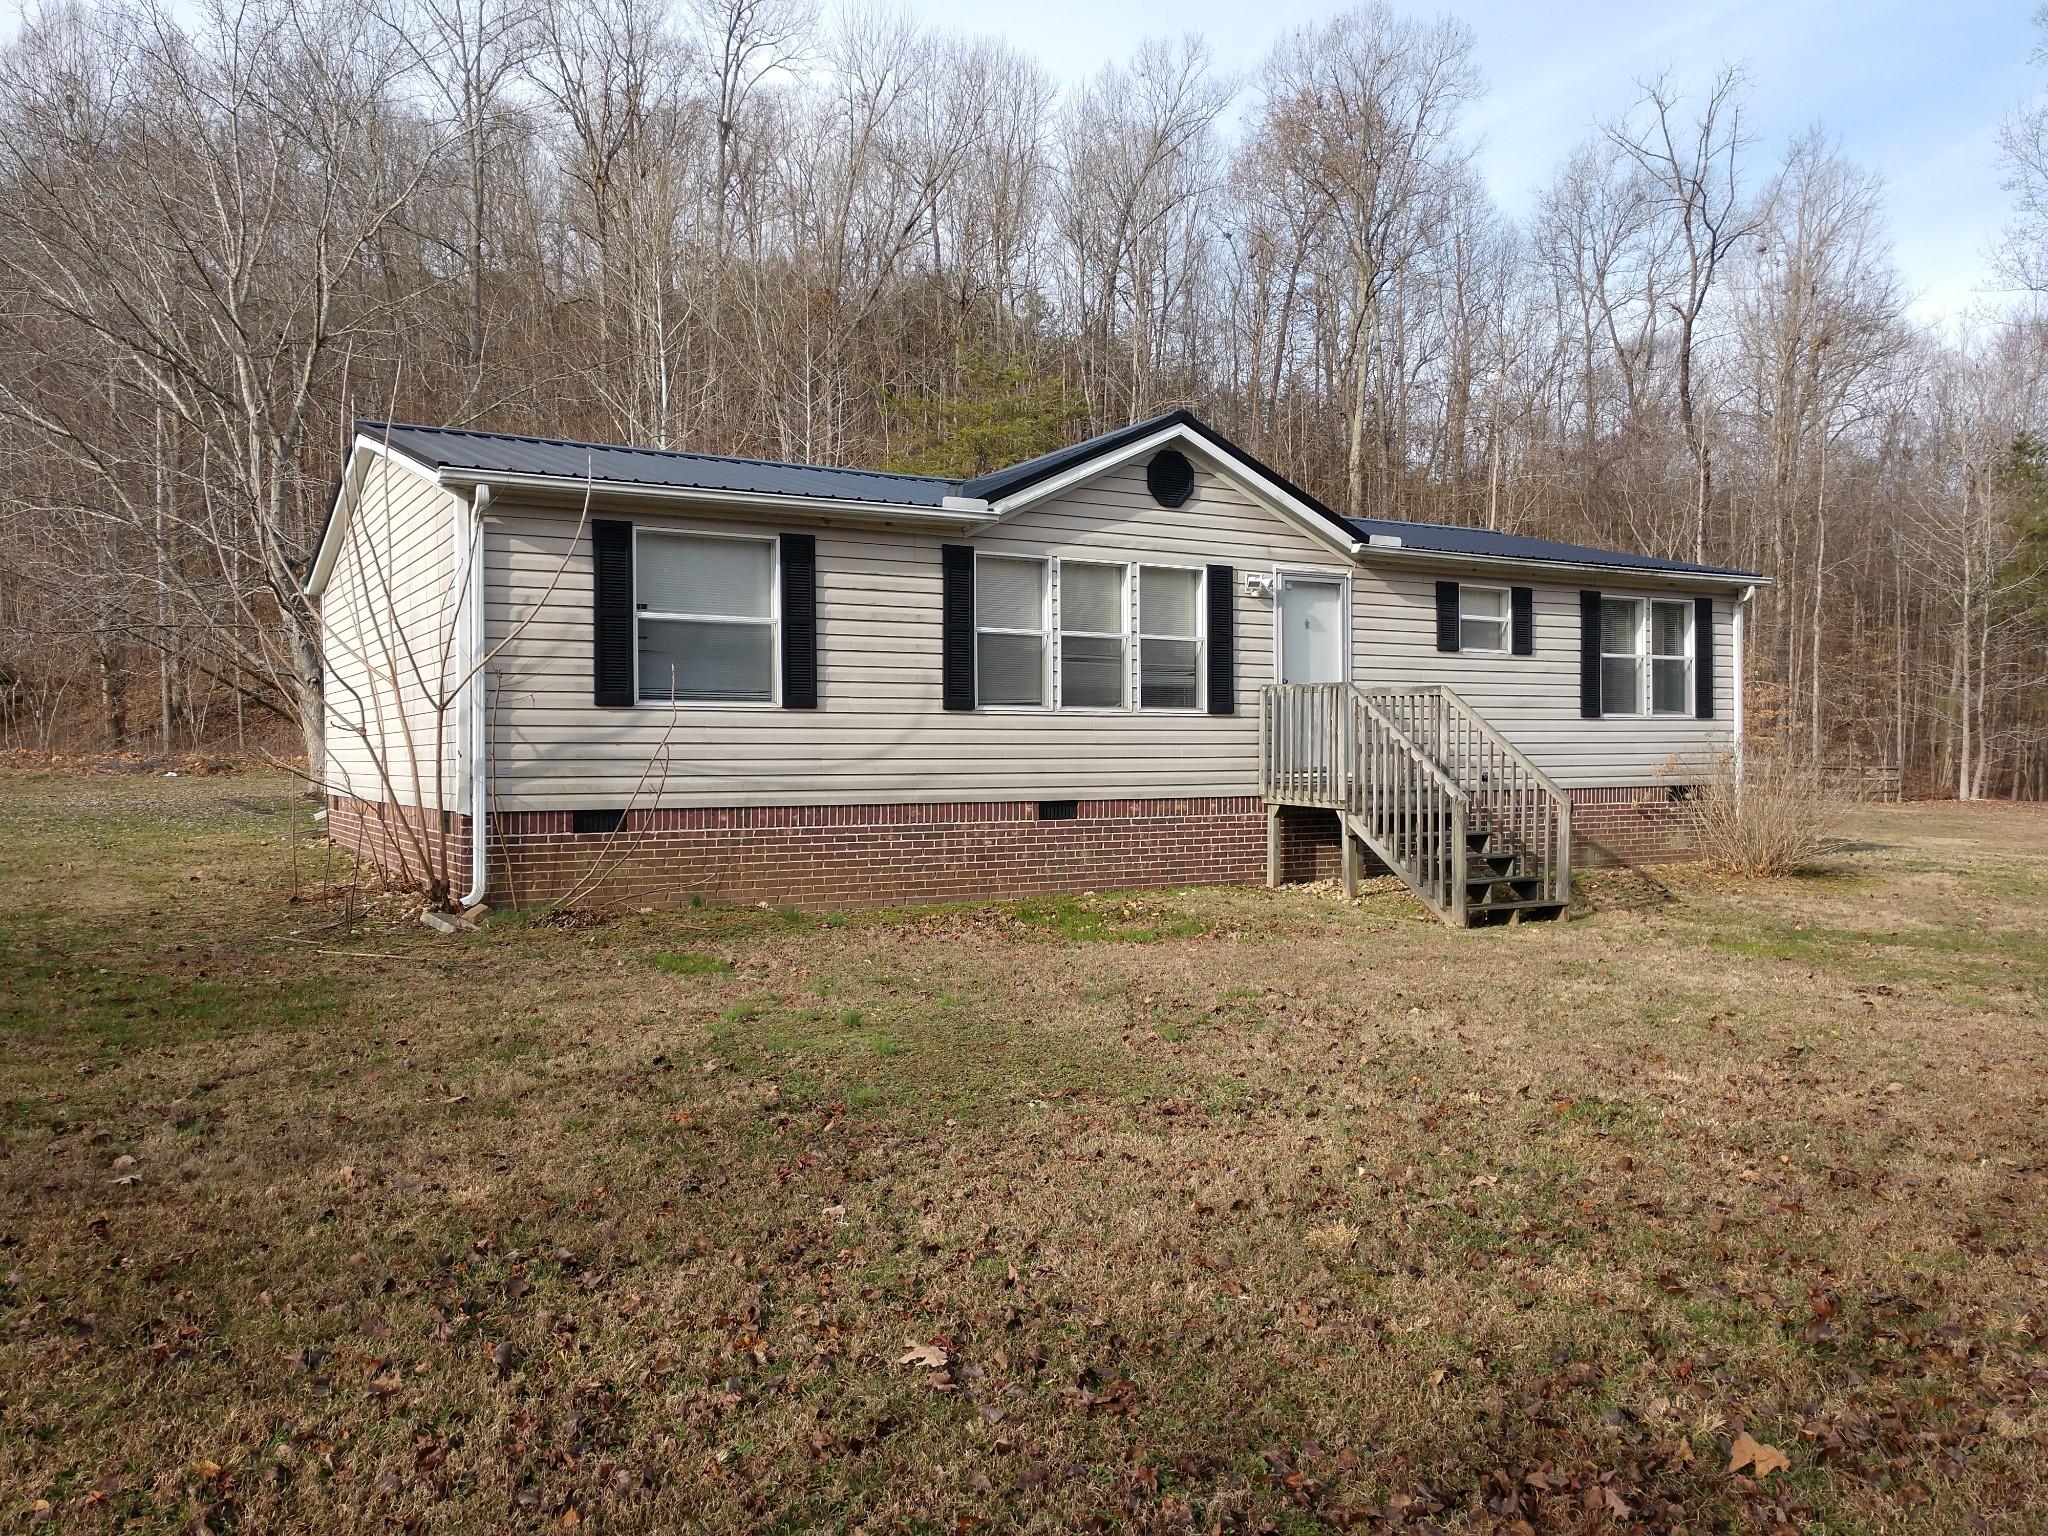 751 Lakestone Rd, Waverly, TN 37185 - Waverly, TN real estate listing